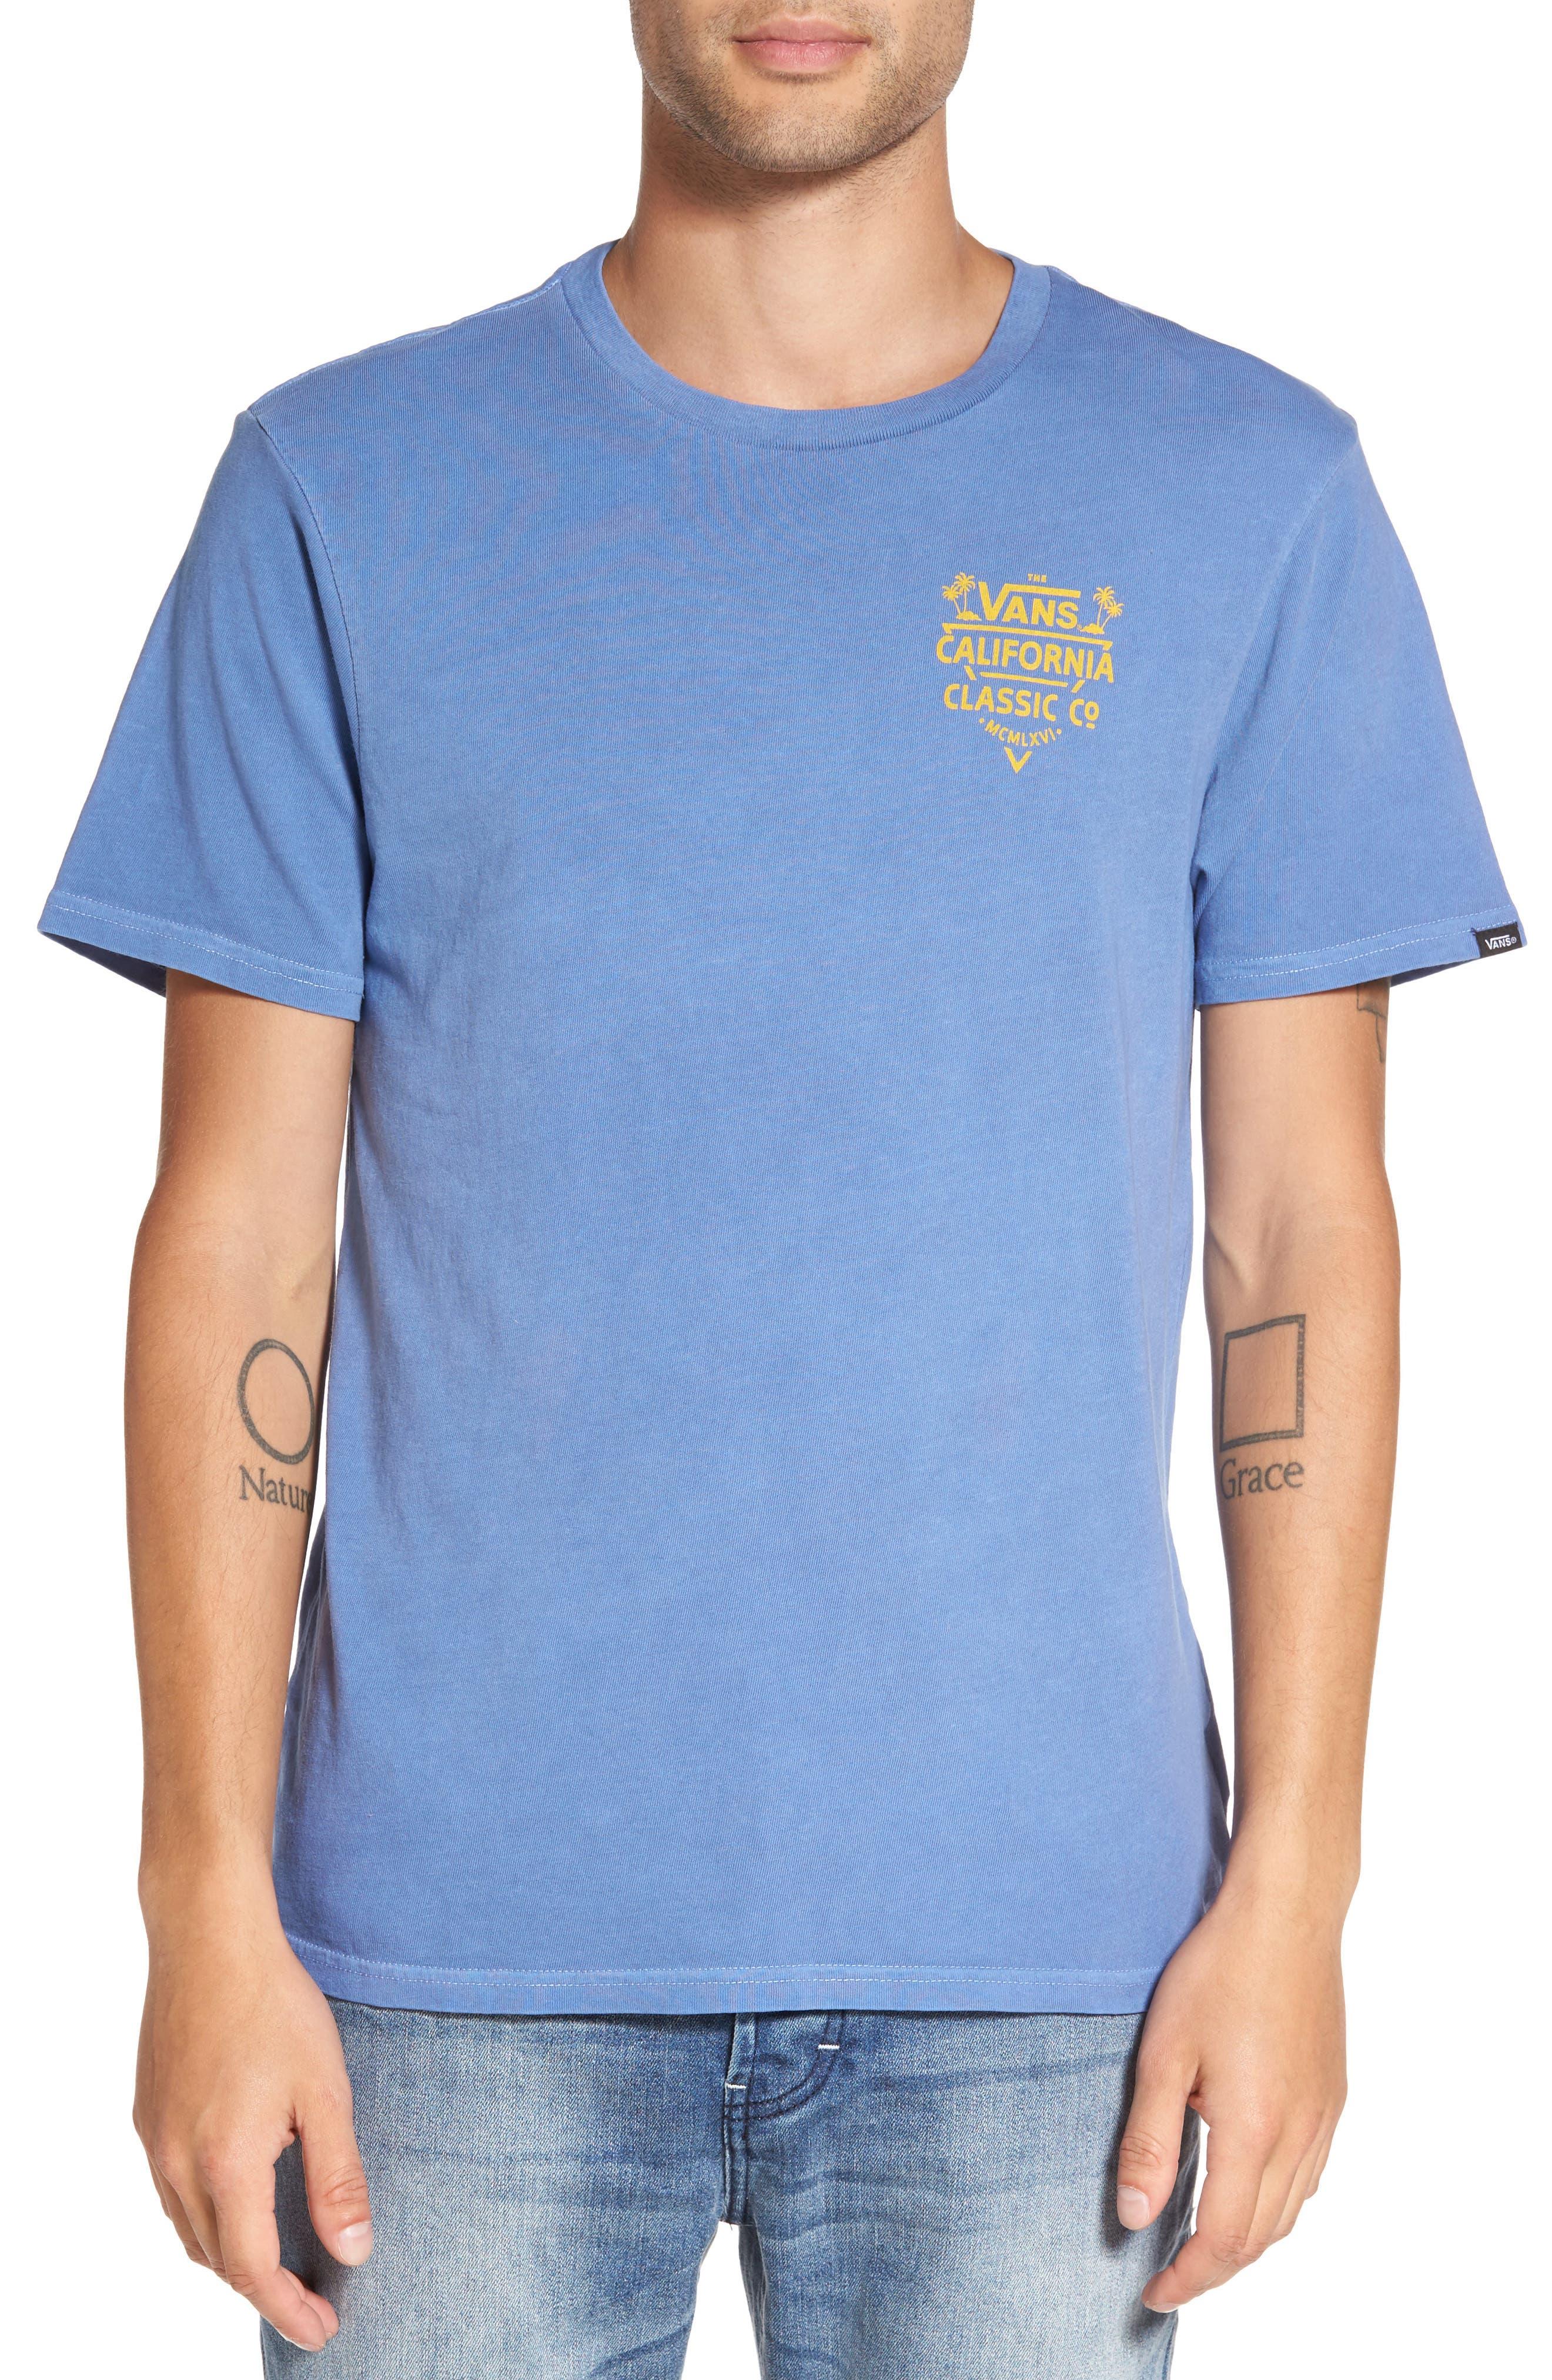 Main Image - Vans California Classic Co. Overdye T-Shirt